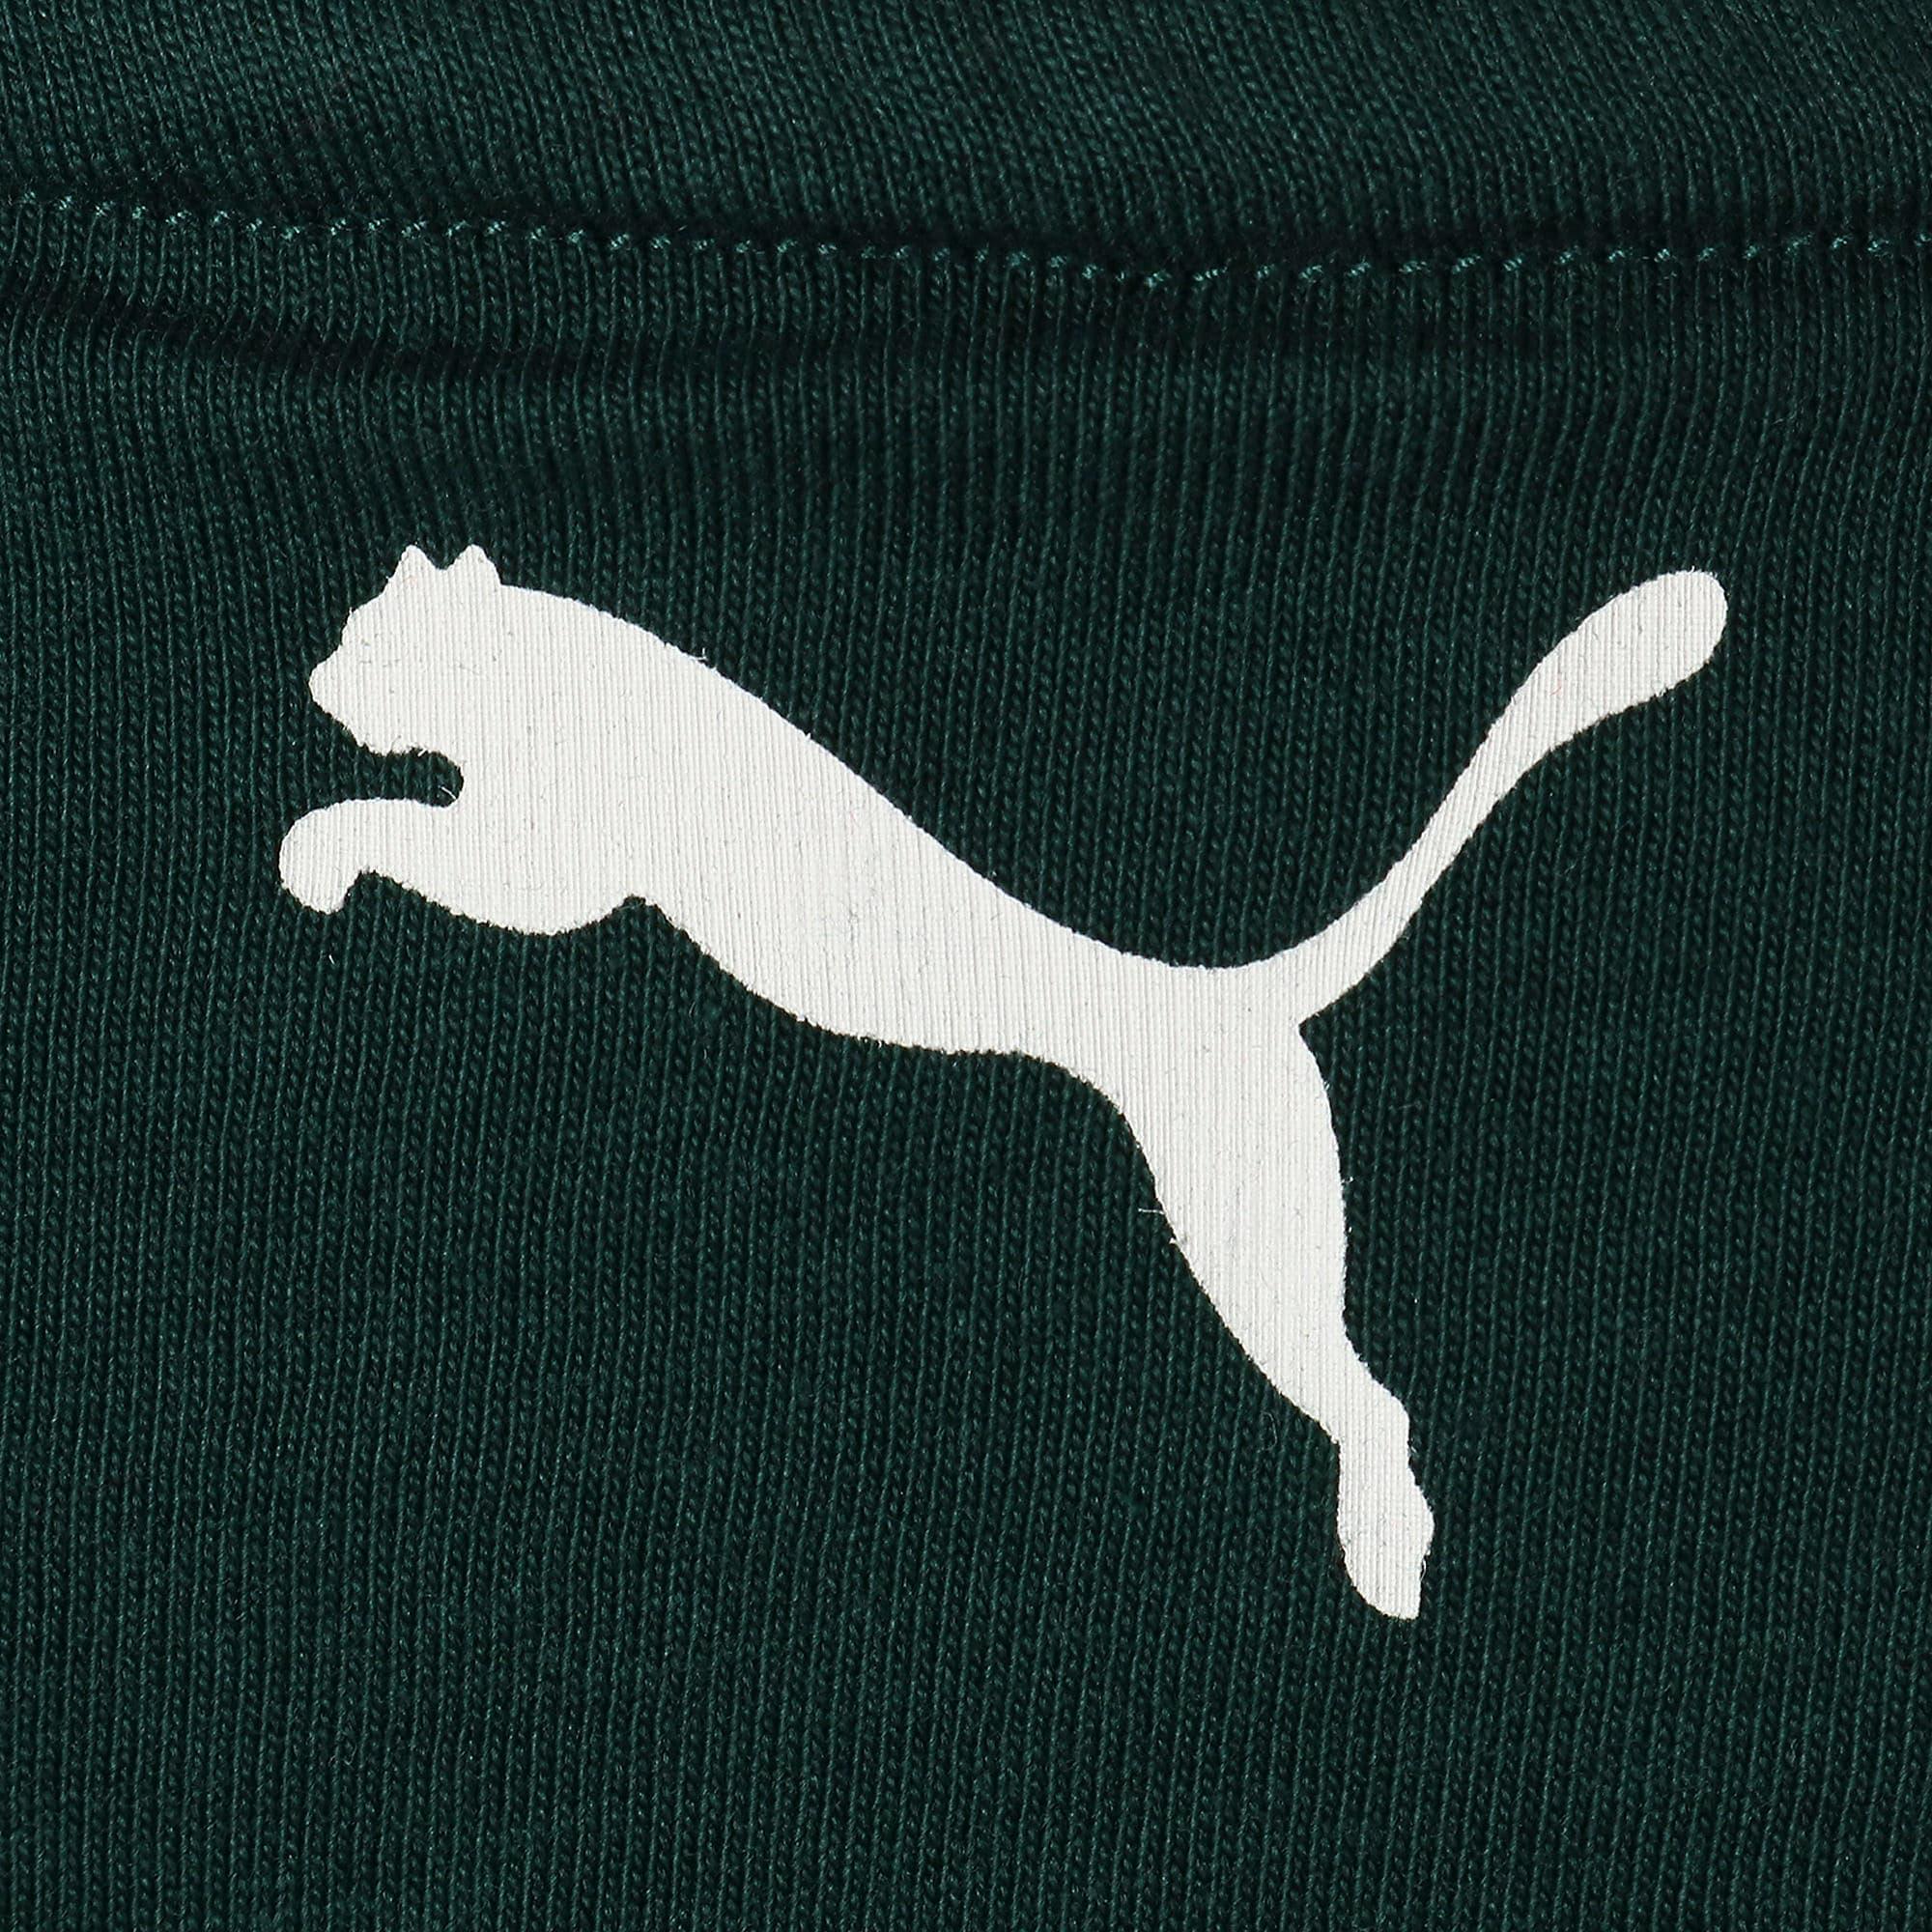 Thumbnail 4 of キッズ ALPHA SS グラフィック Tシャツ 半袖, Ponderosa Pine, medium-JPN